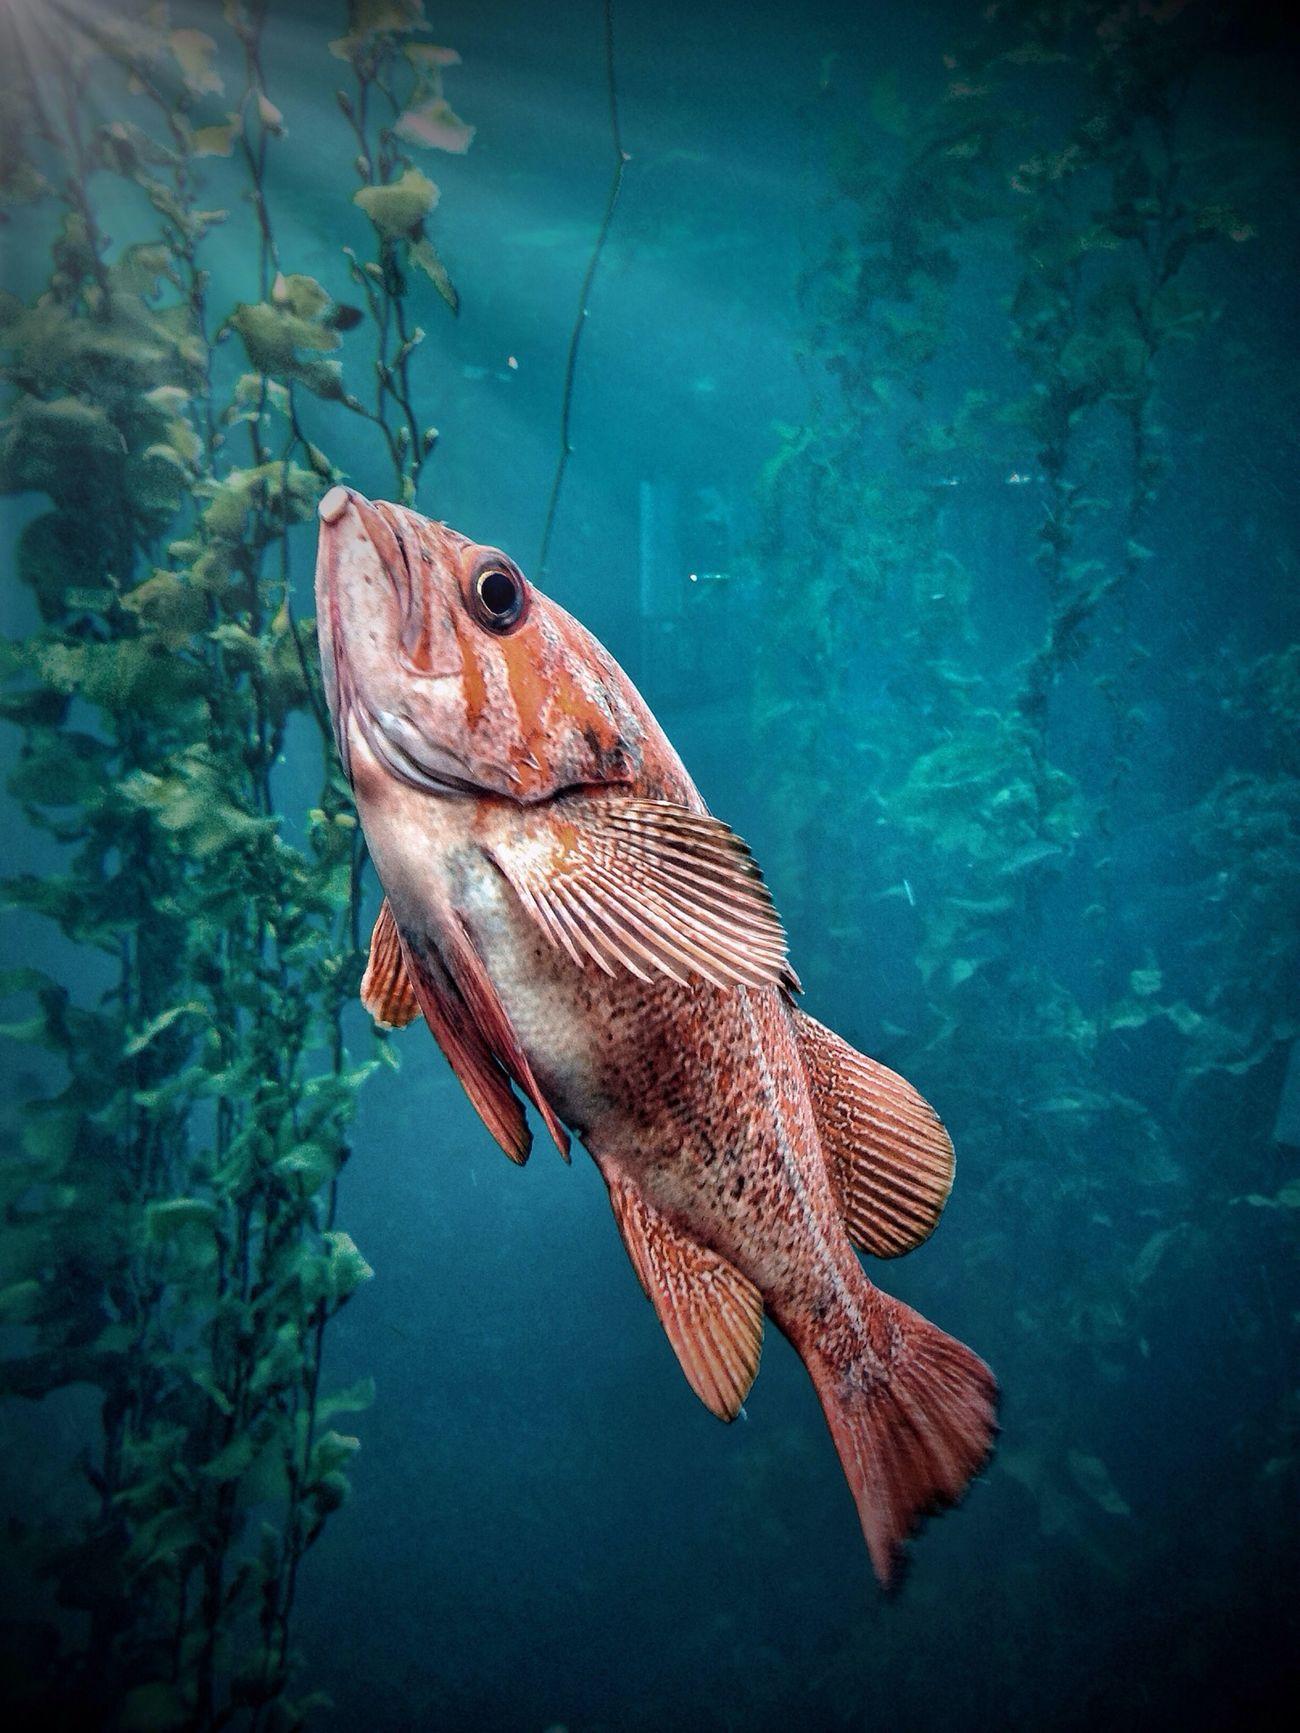 HDR Hdriphoneography Monterey Bay Aquarium